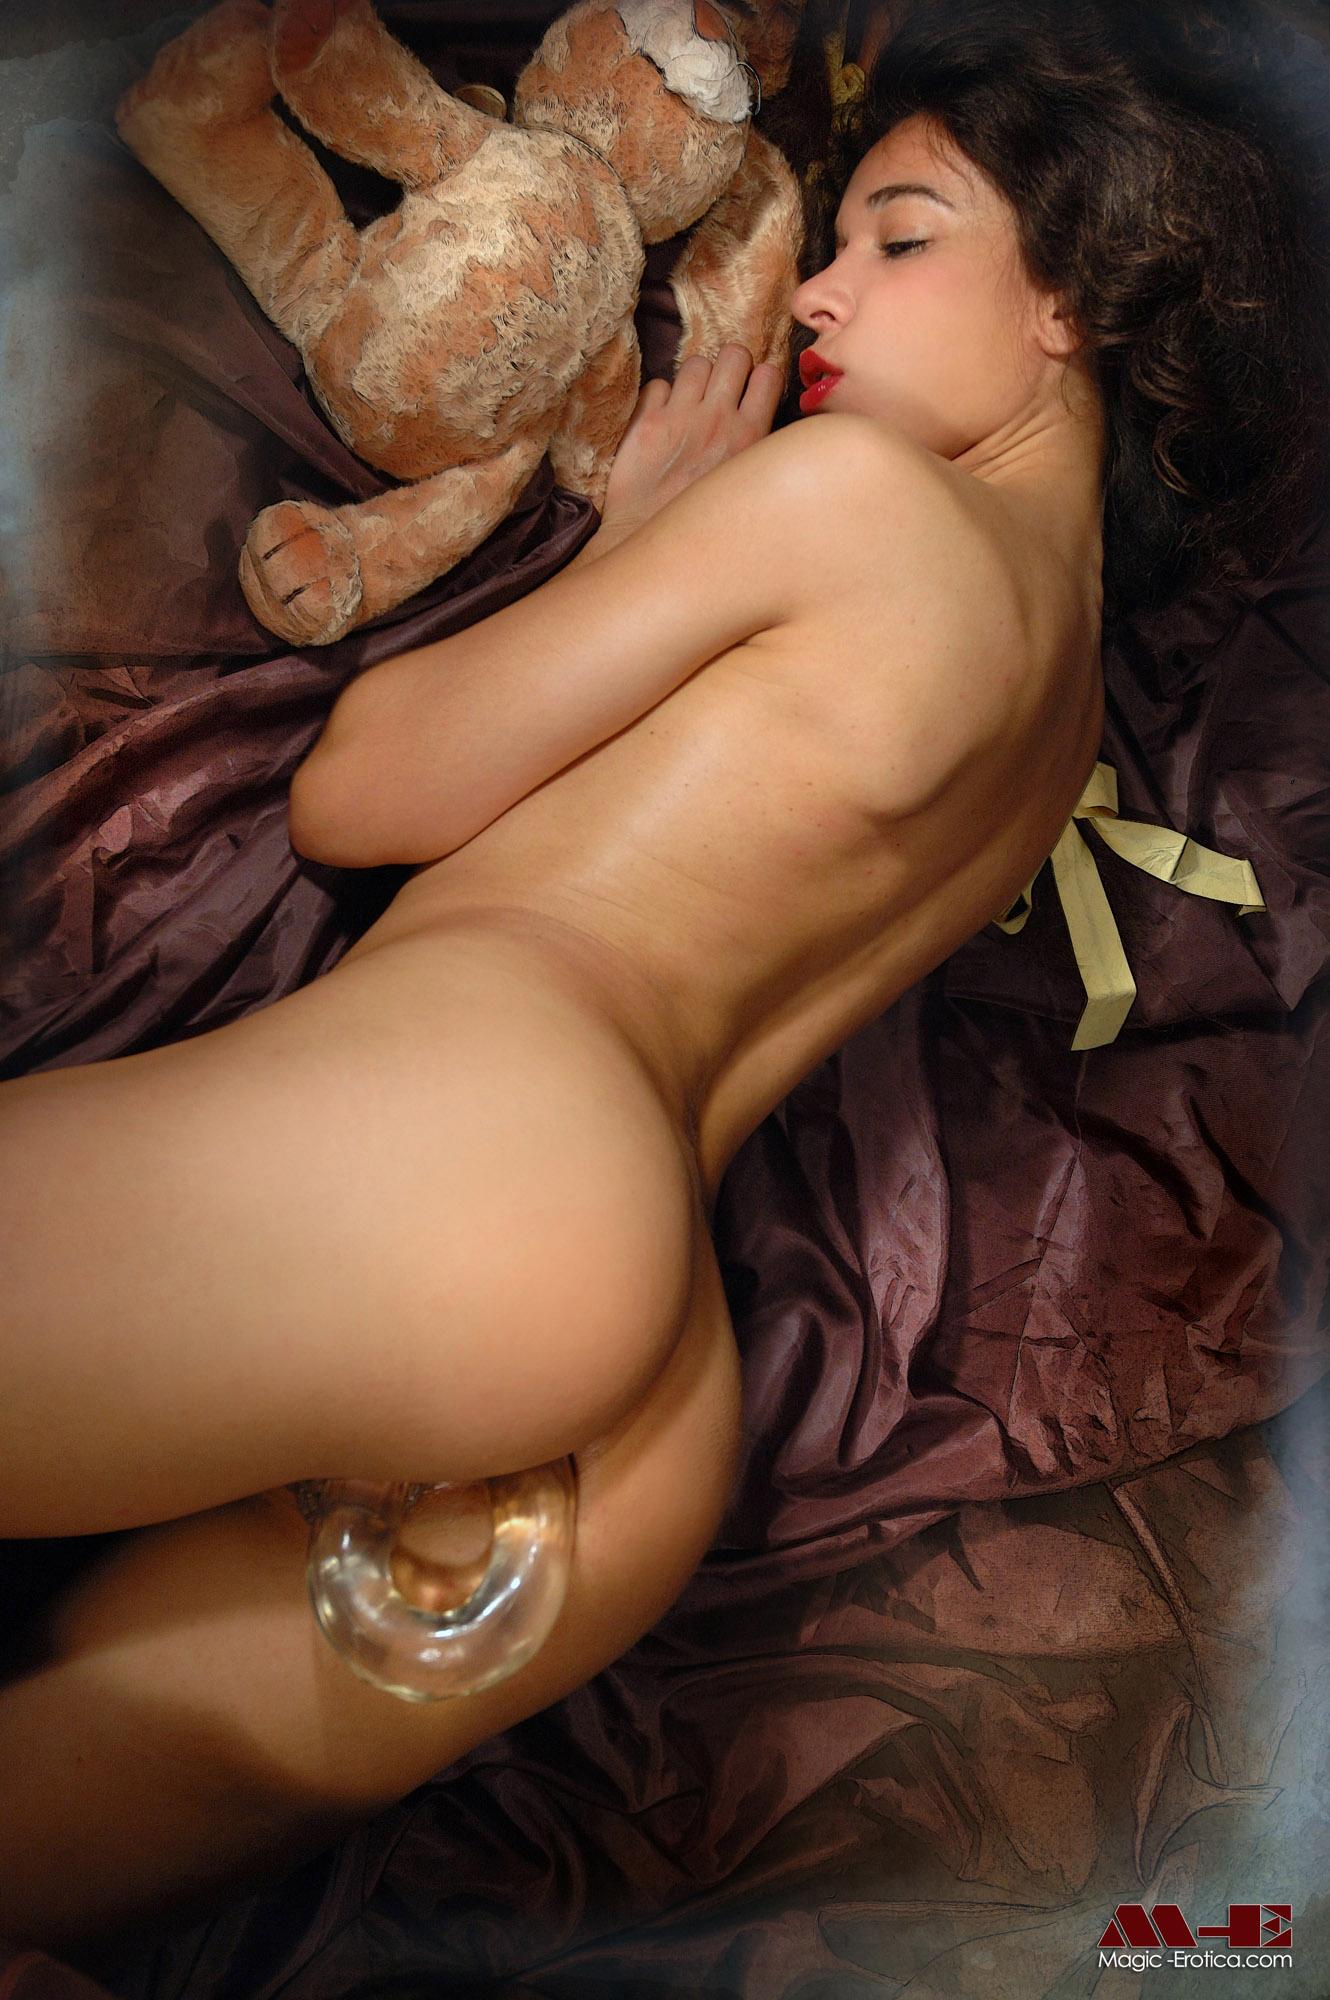 Секс фото еротика порно фото 23 фотография